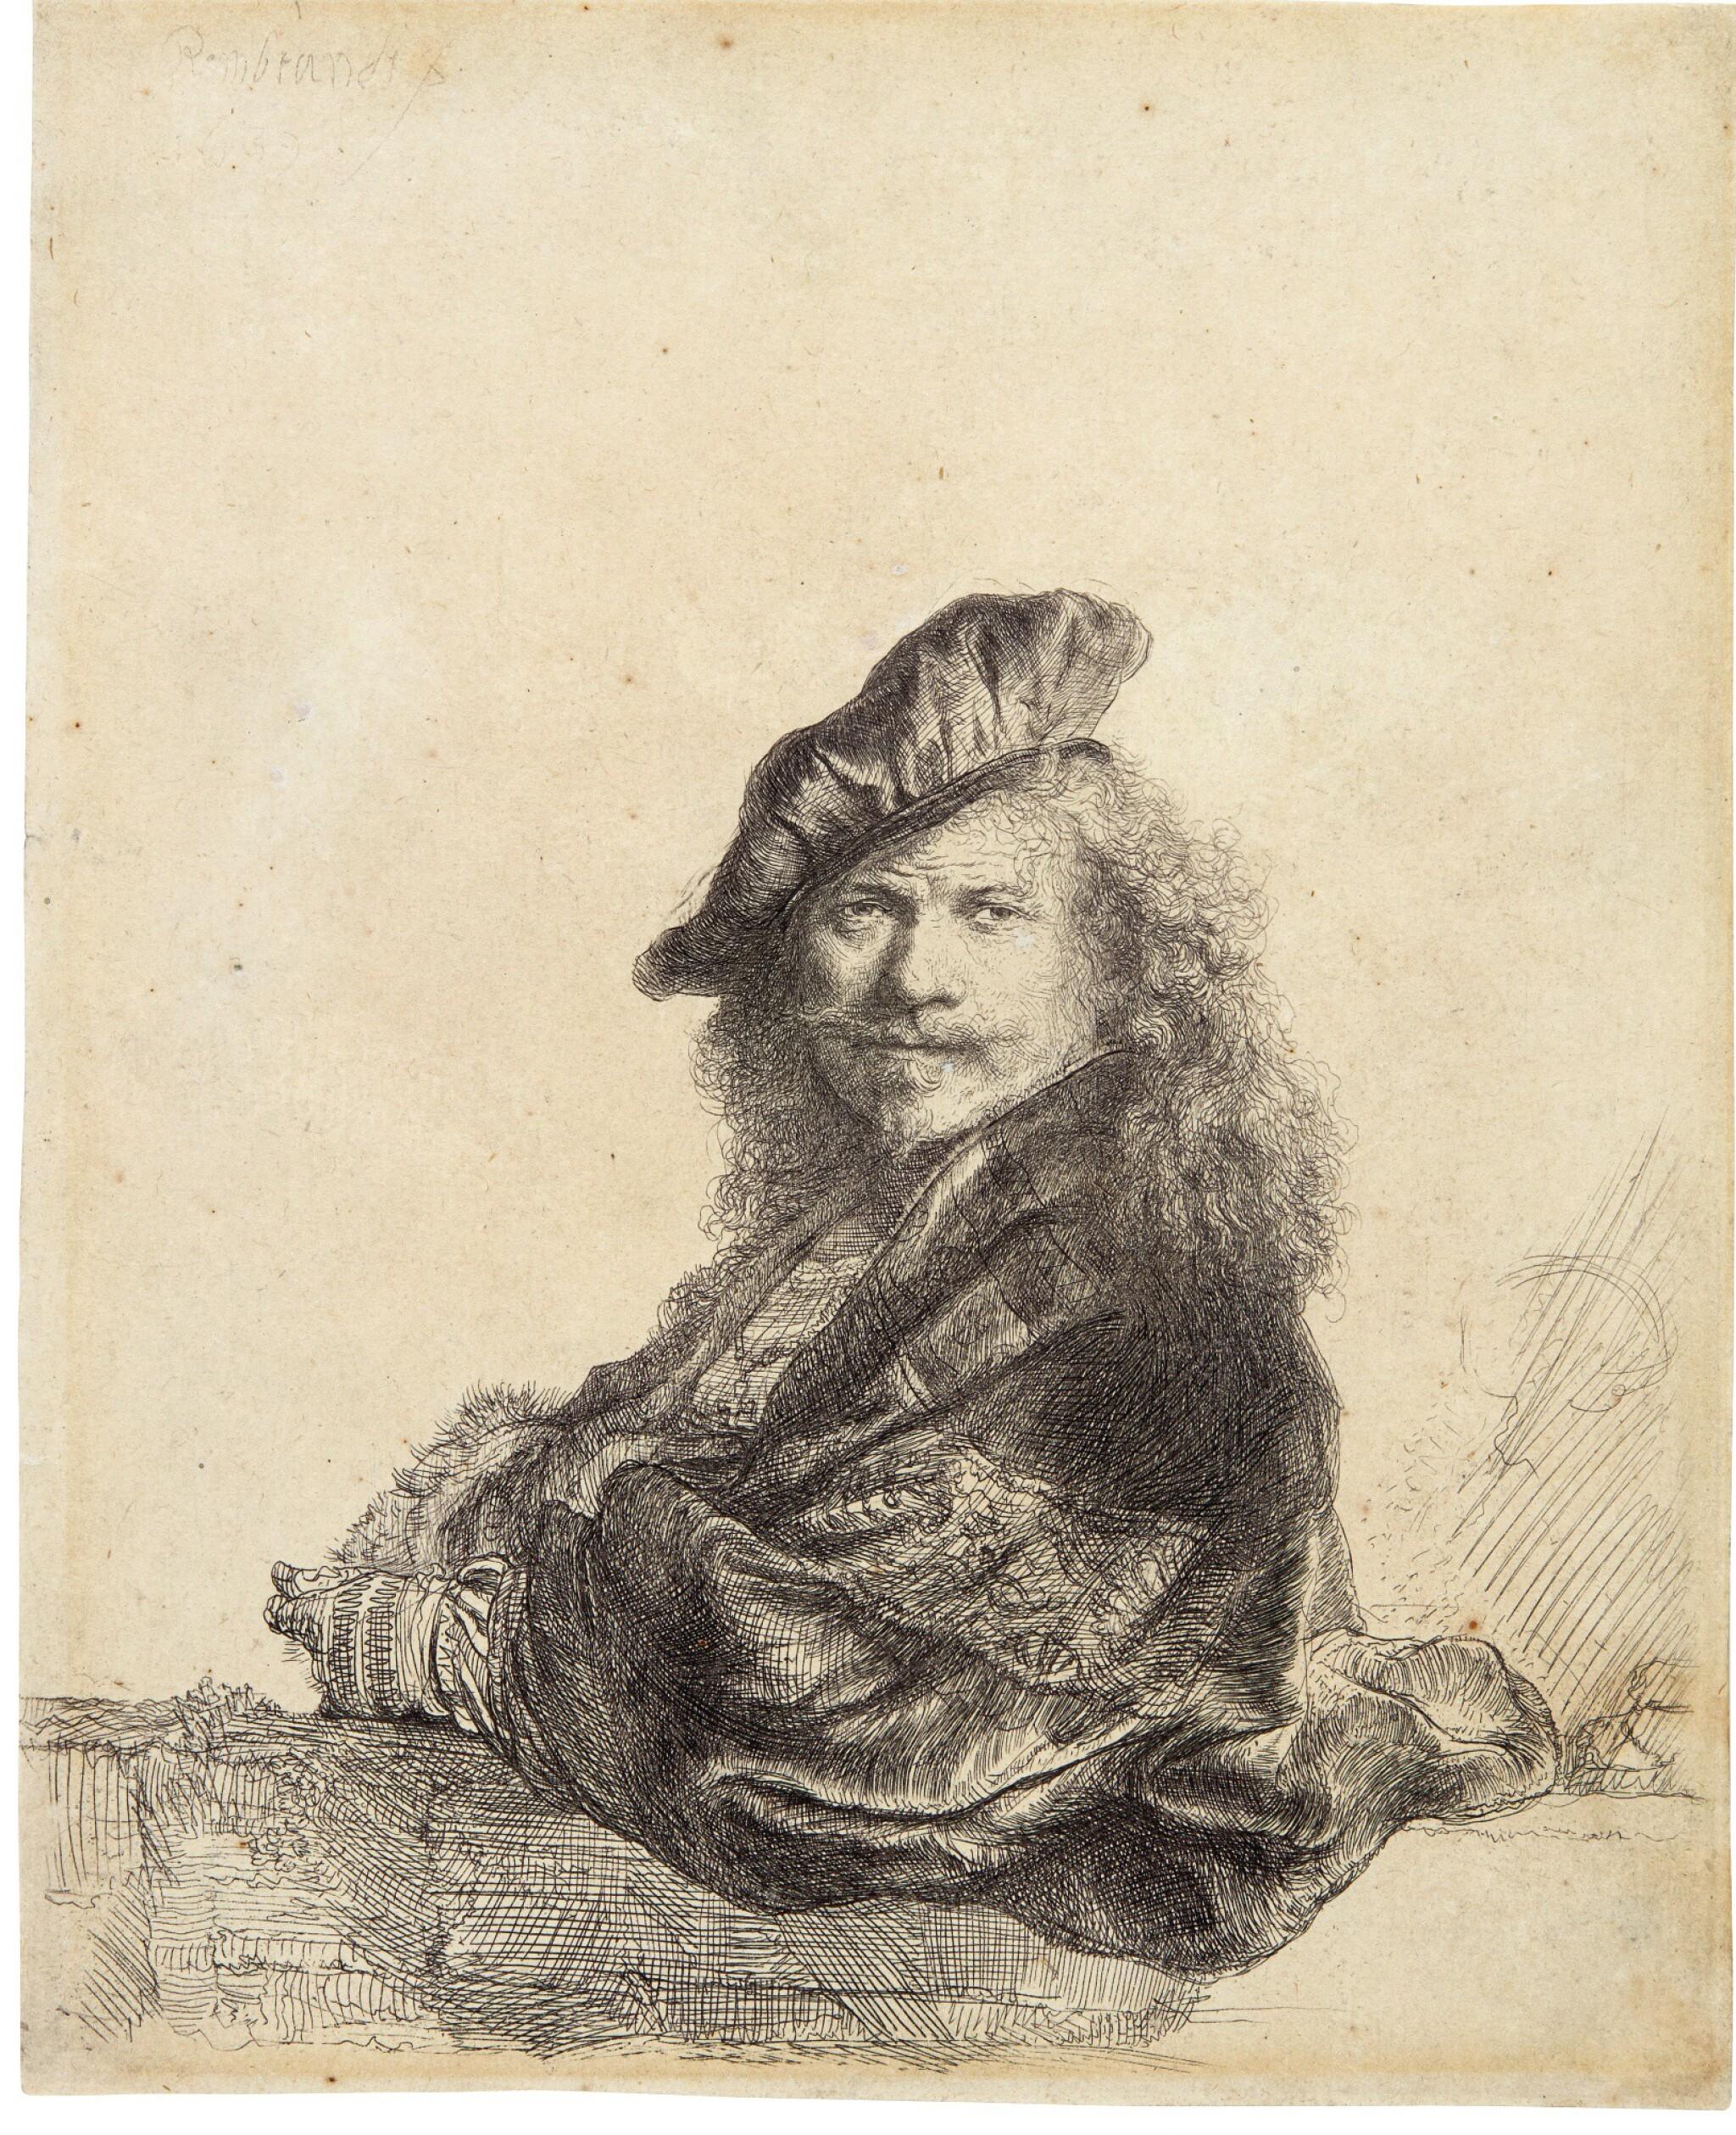 REMBRANDT HARMENSZ. VAN RIJN | SELF-PORTRAIT LEANING ON A STONE SILL (B., HOLL. 21; NEW HOLL. 171; H. 168)